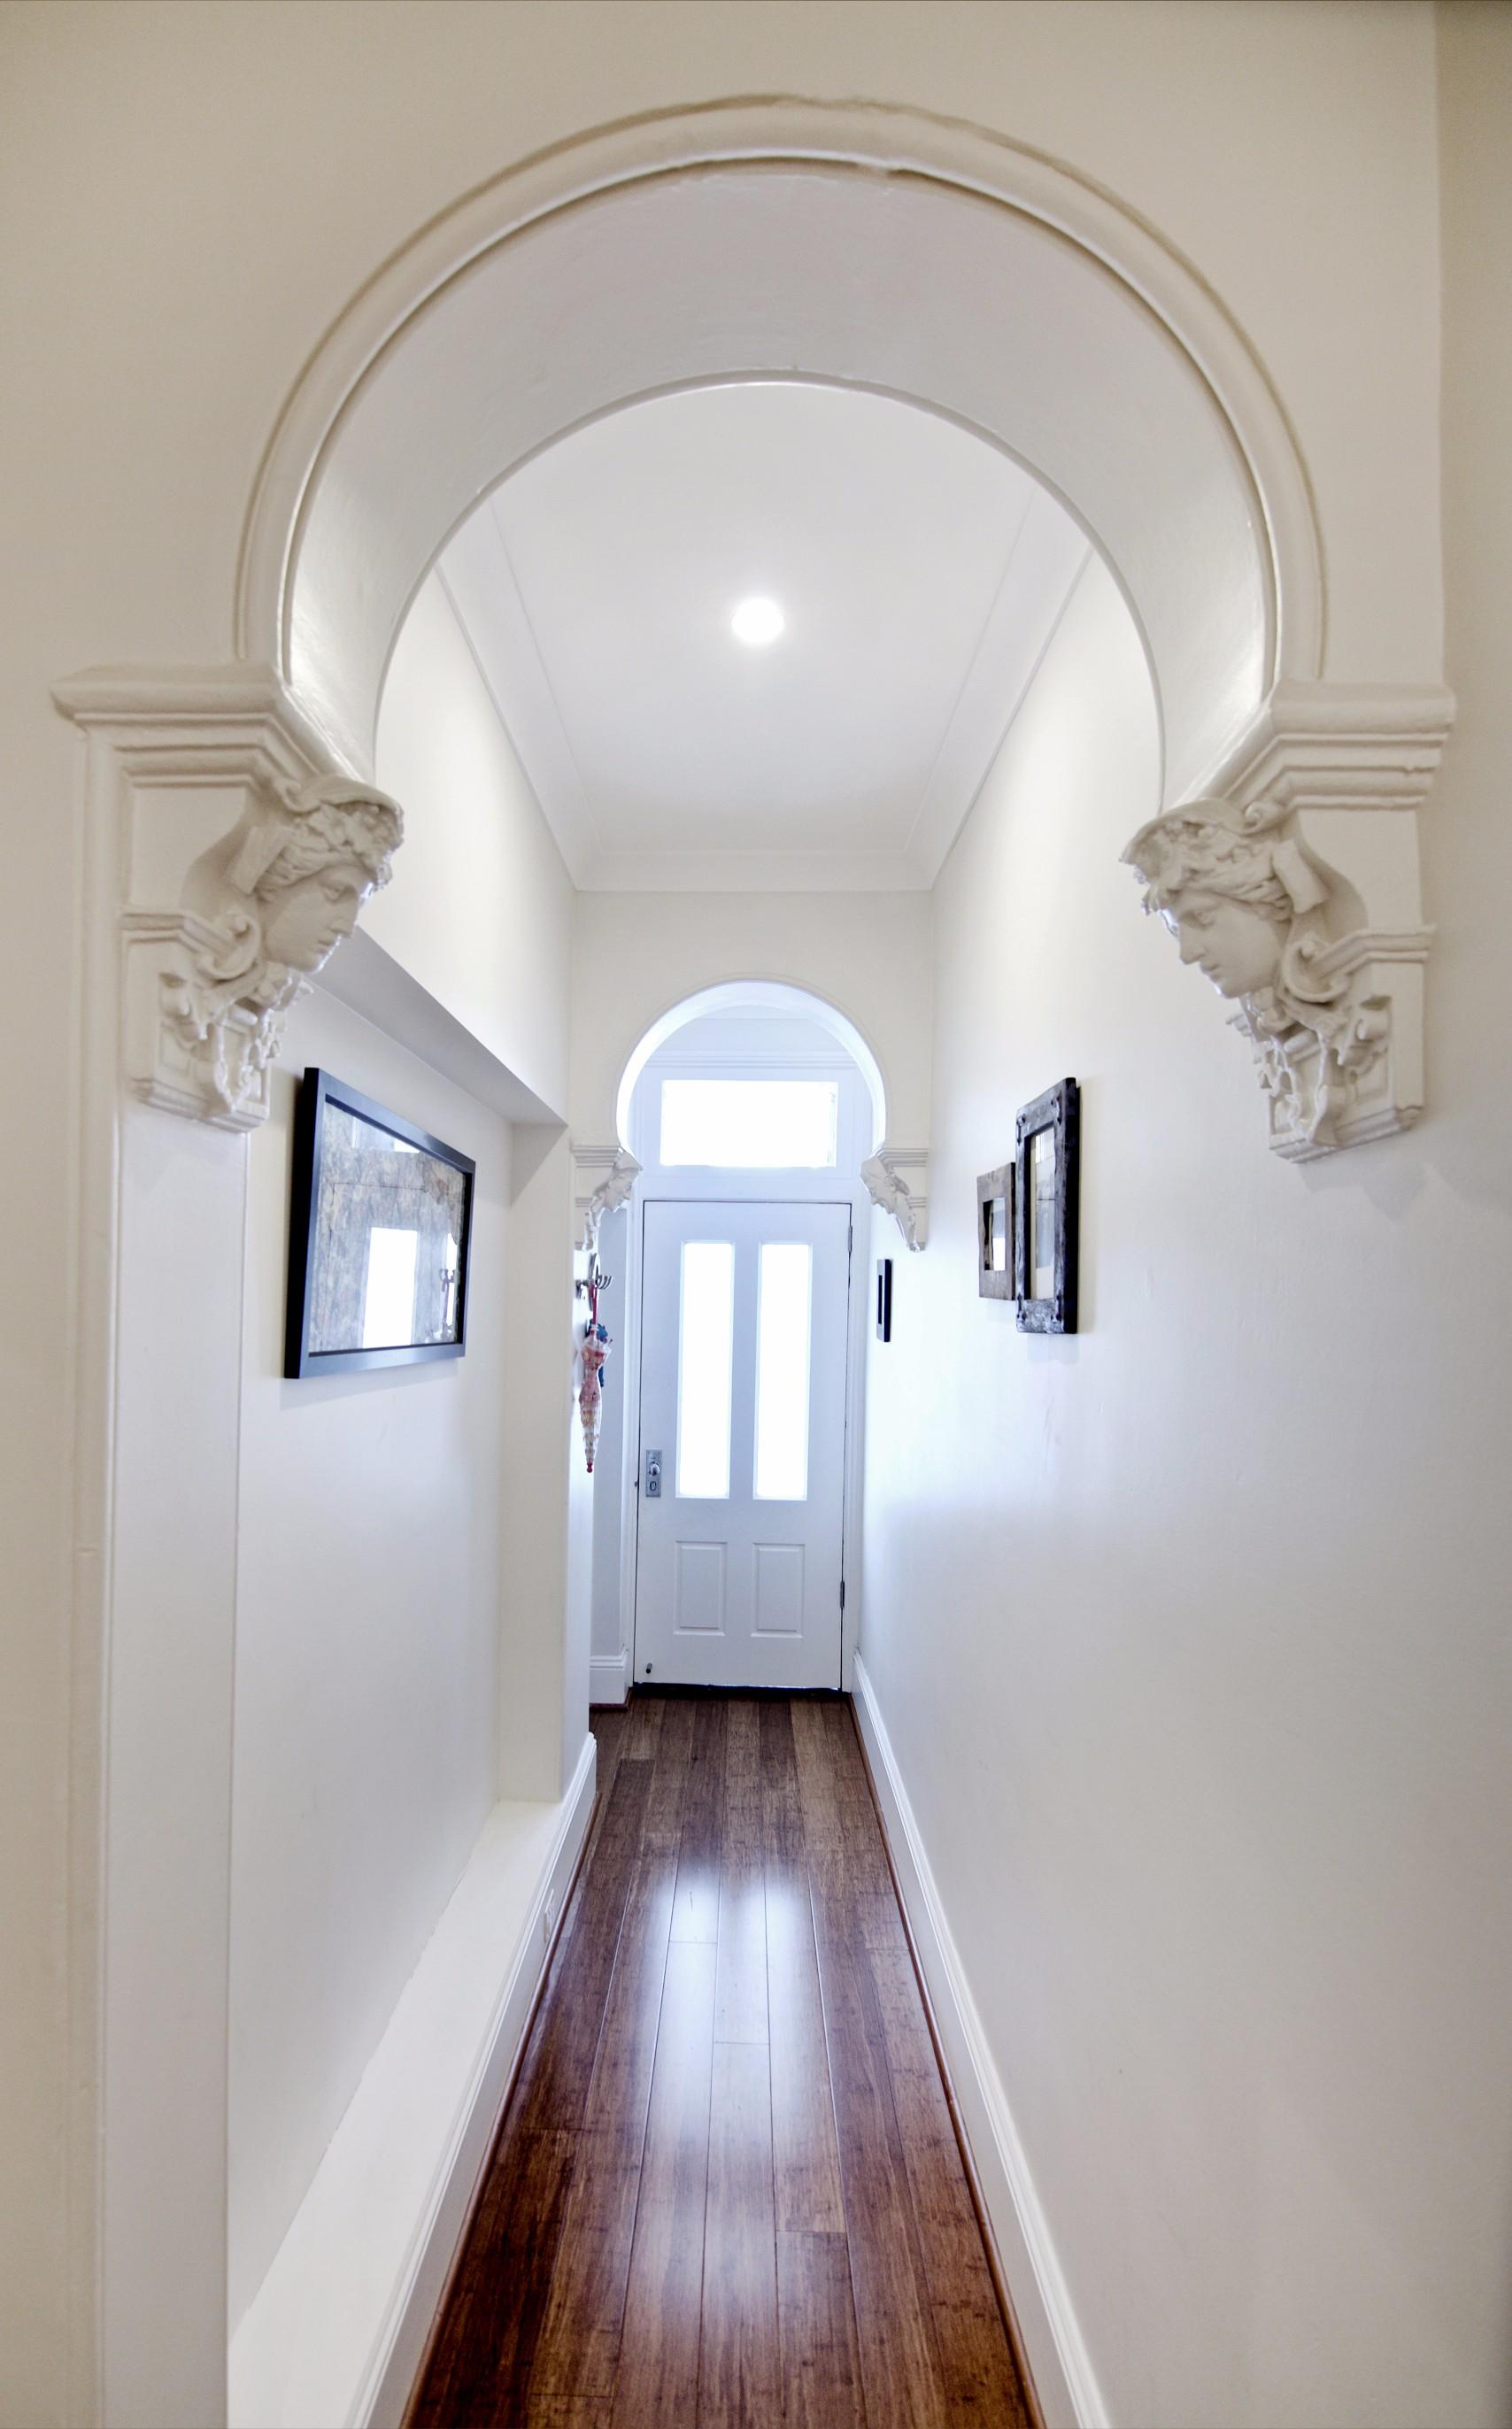 Nvisage_Custom_Design_Homes_Alterations_Additions_Partington2.jpg